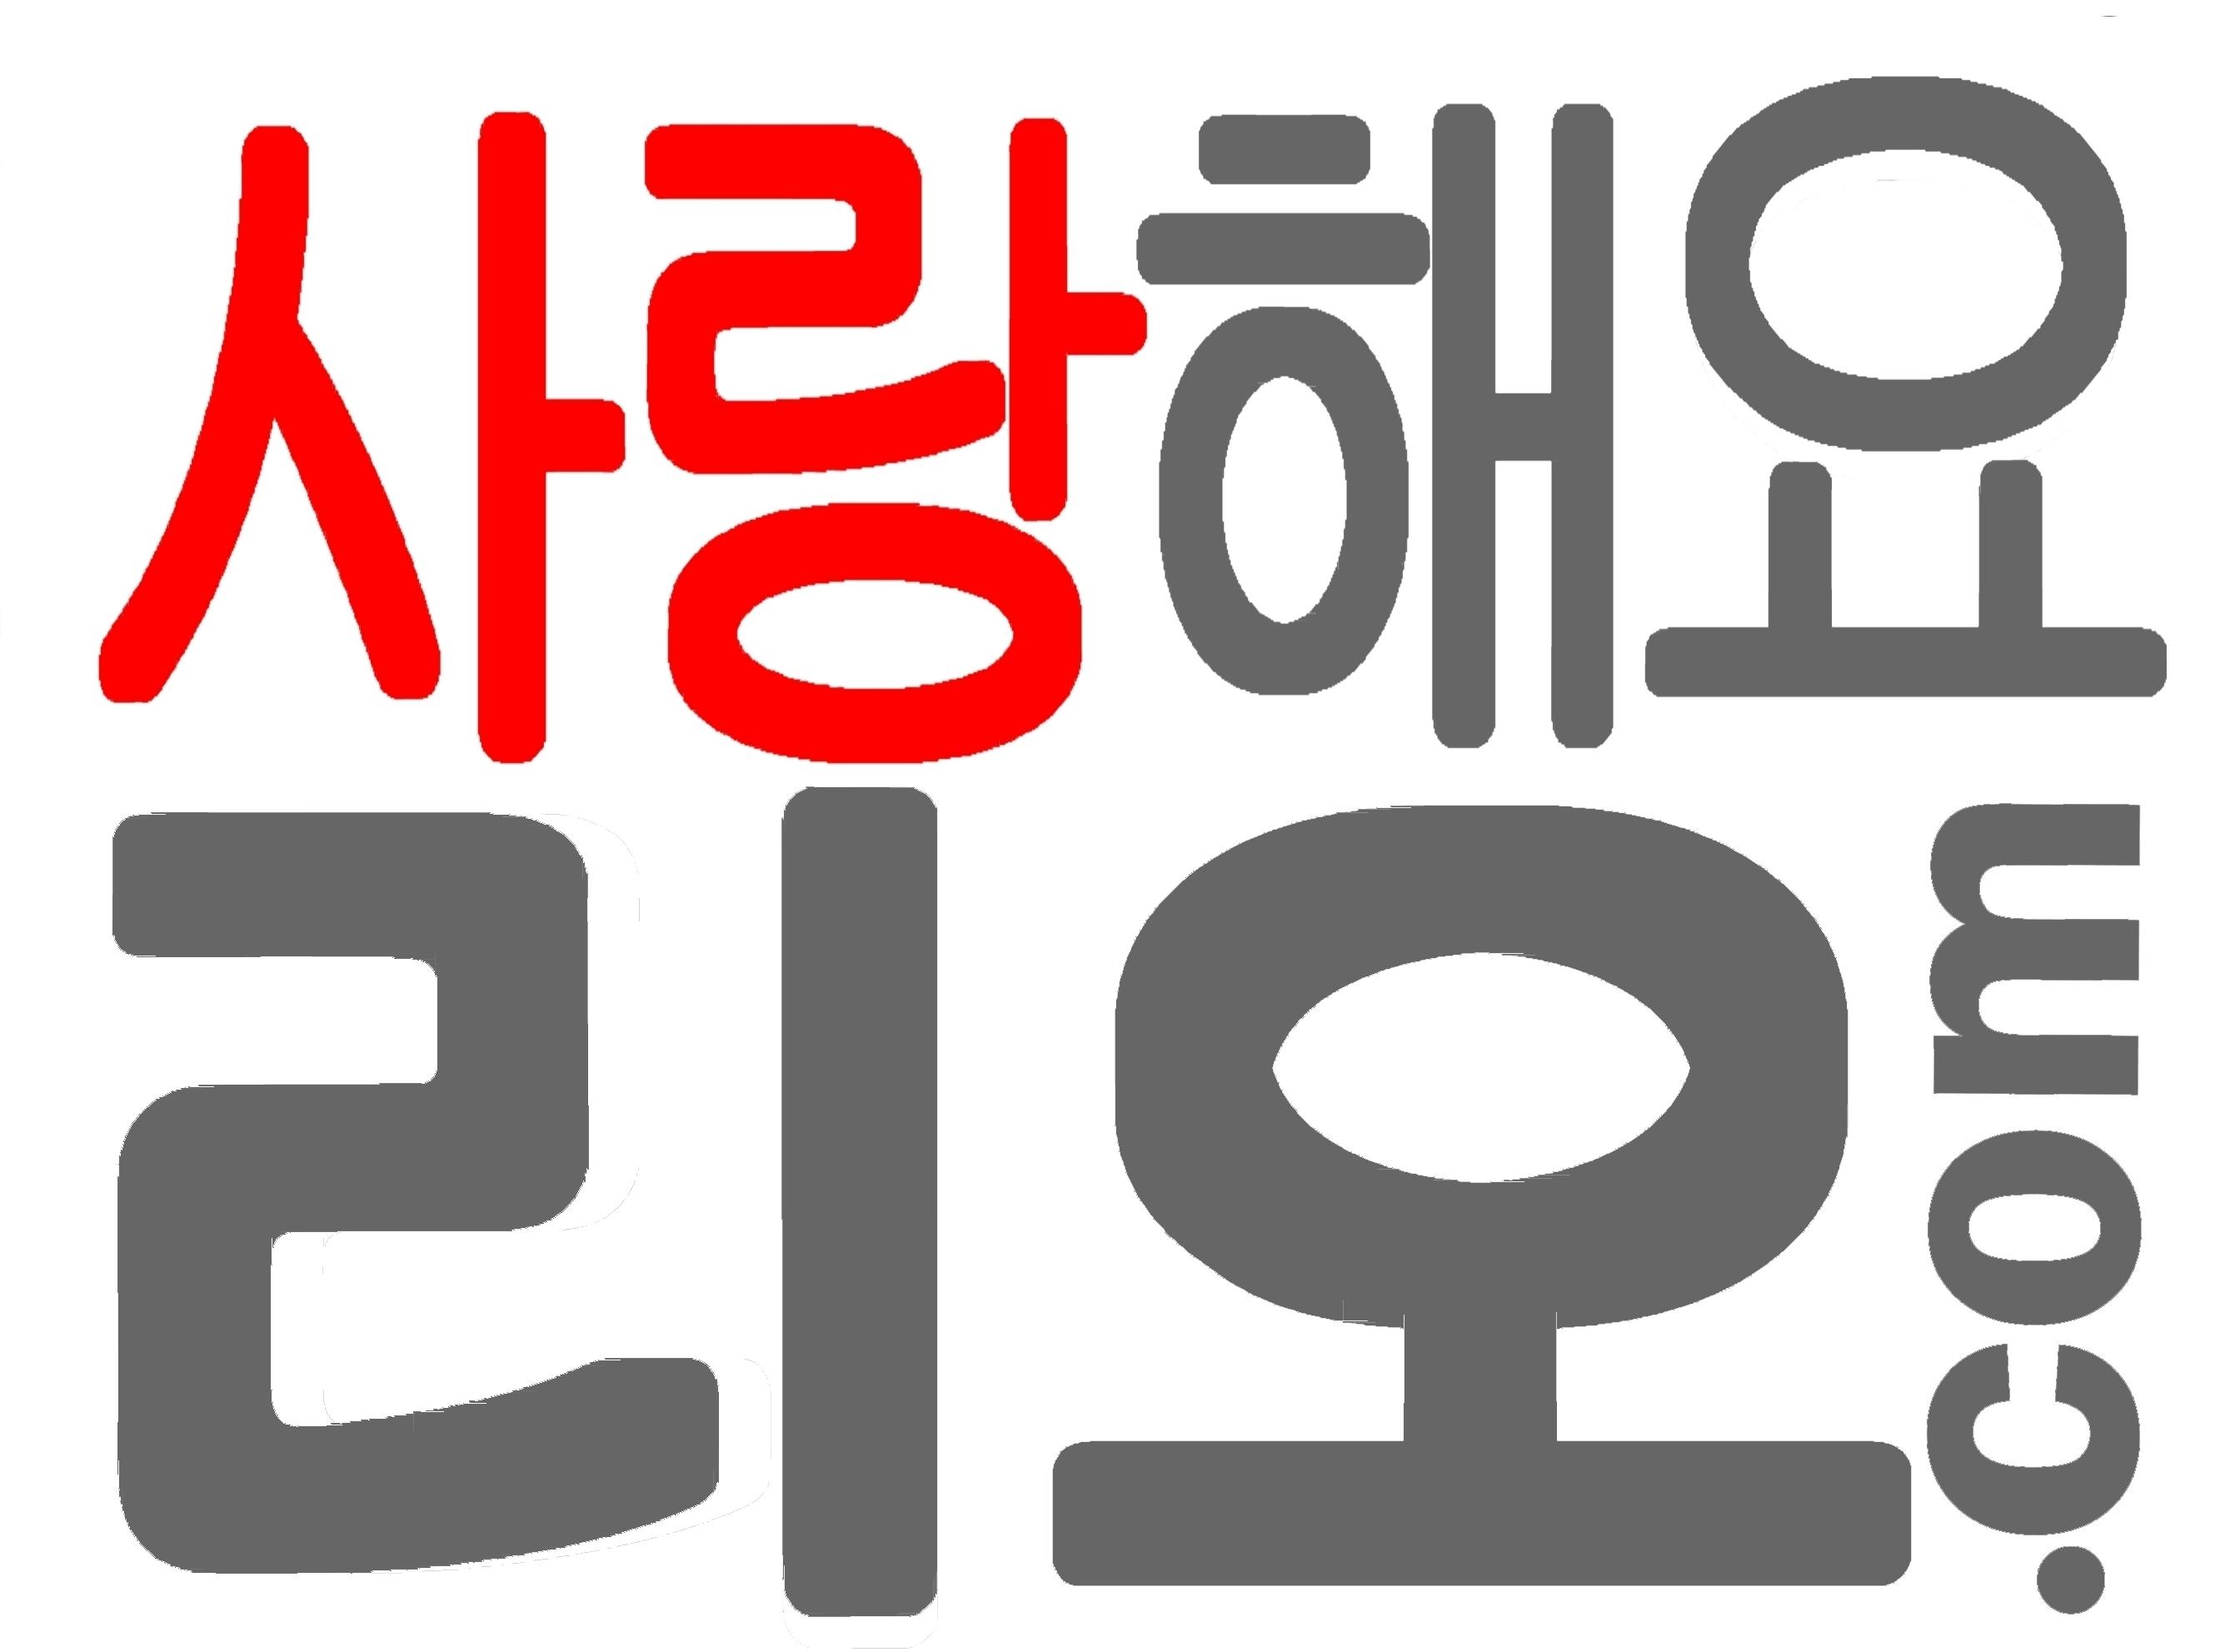 I love rio invites translators and contributors from around the world i love rio in korean buycottarizona Choice Image